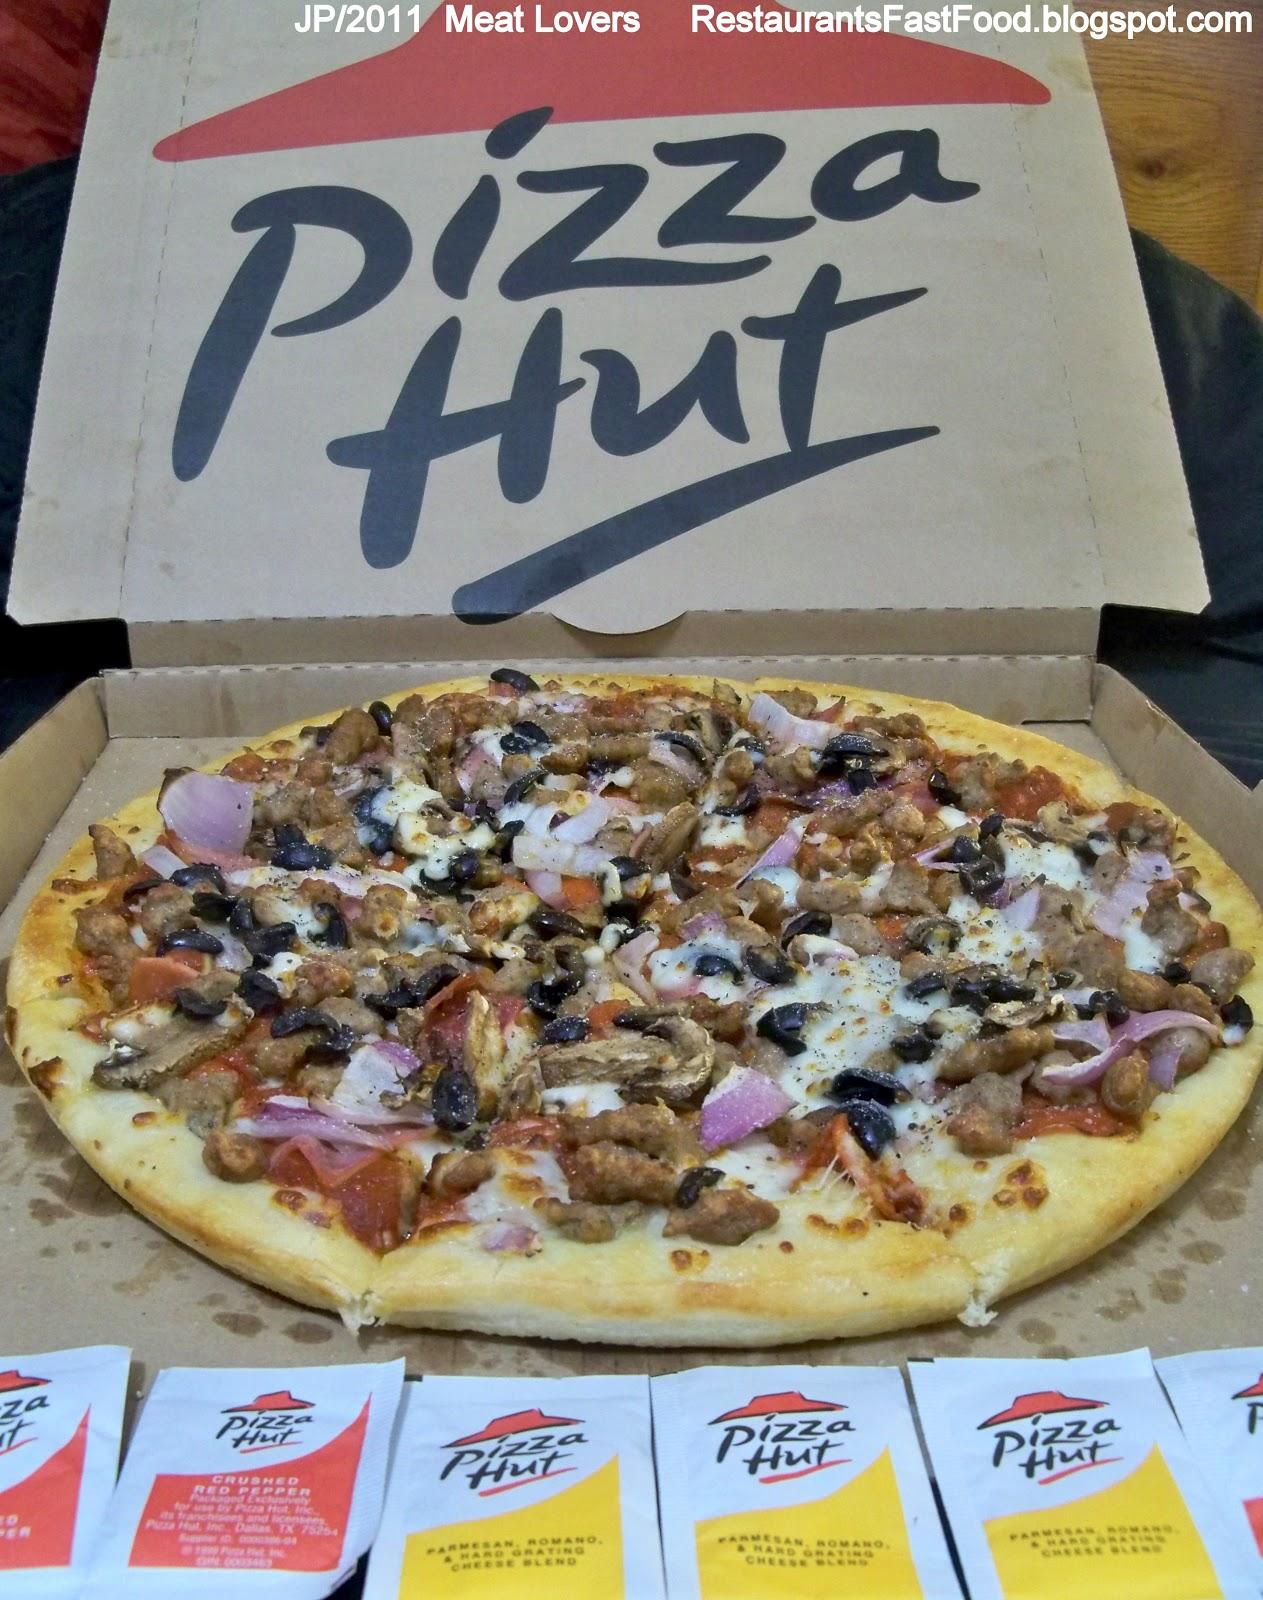 thomson mcduffie restaurant attorney bank dr hospital pizza hut thomson washington road pizza hut pasta wing street restaurant mcduffie county thomson ga pizza hut thomson wing street pizza